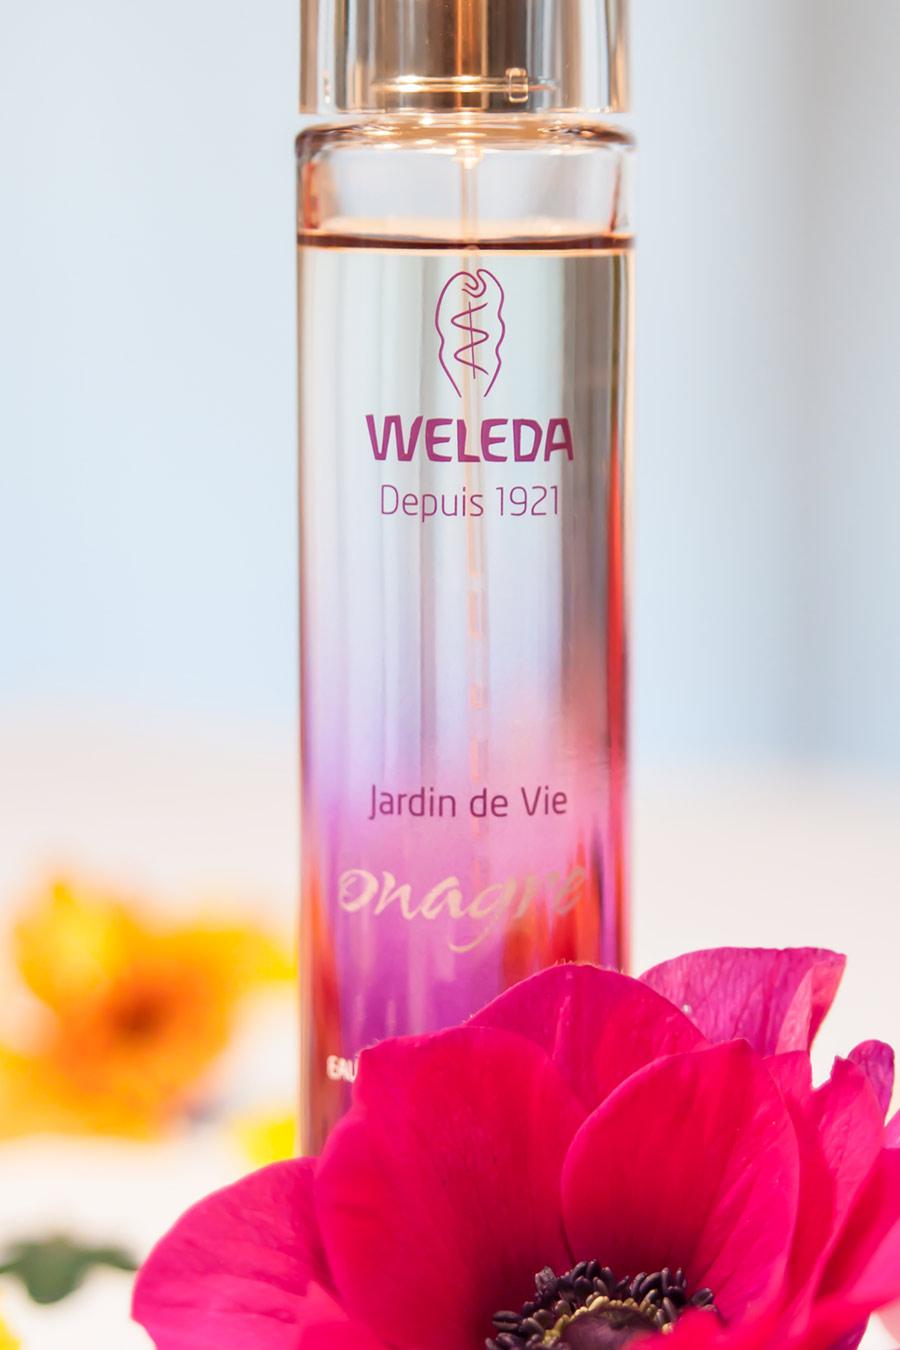 Weleda Parfum Onagre